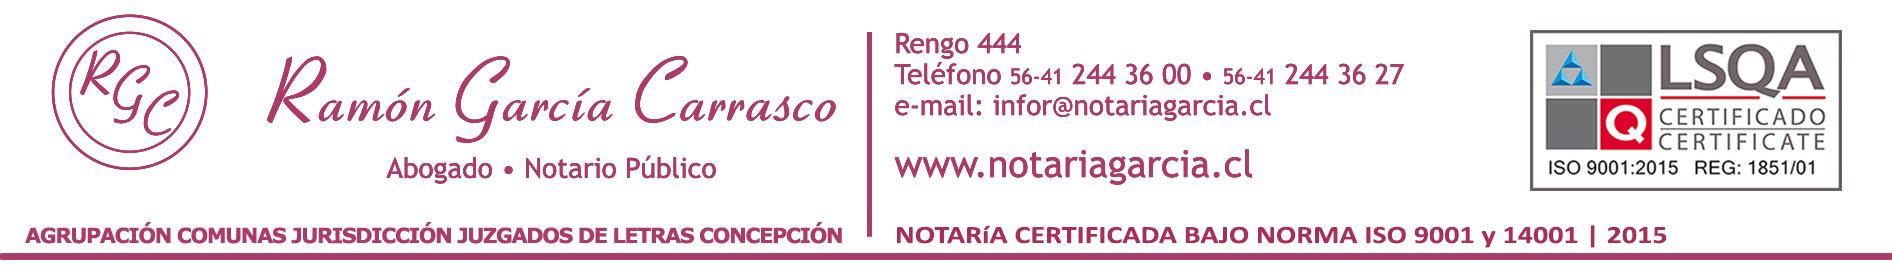 Membrete NotariaGarcia